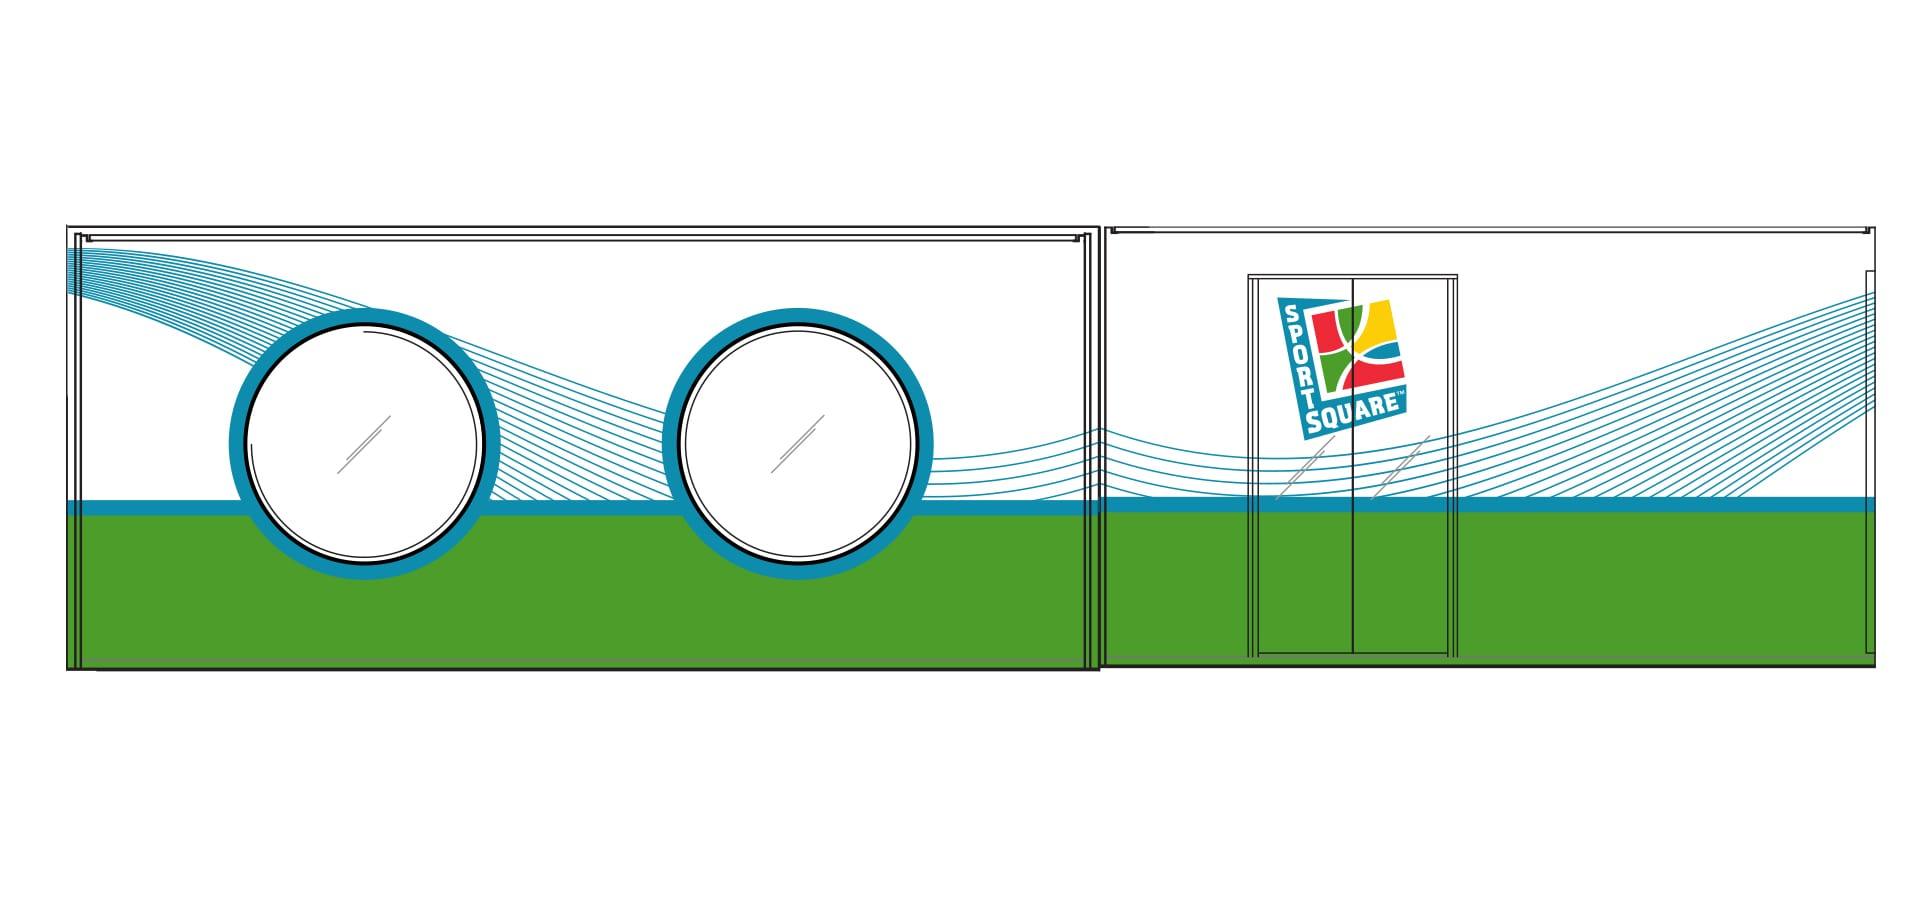 Sports Square branding concept